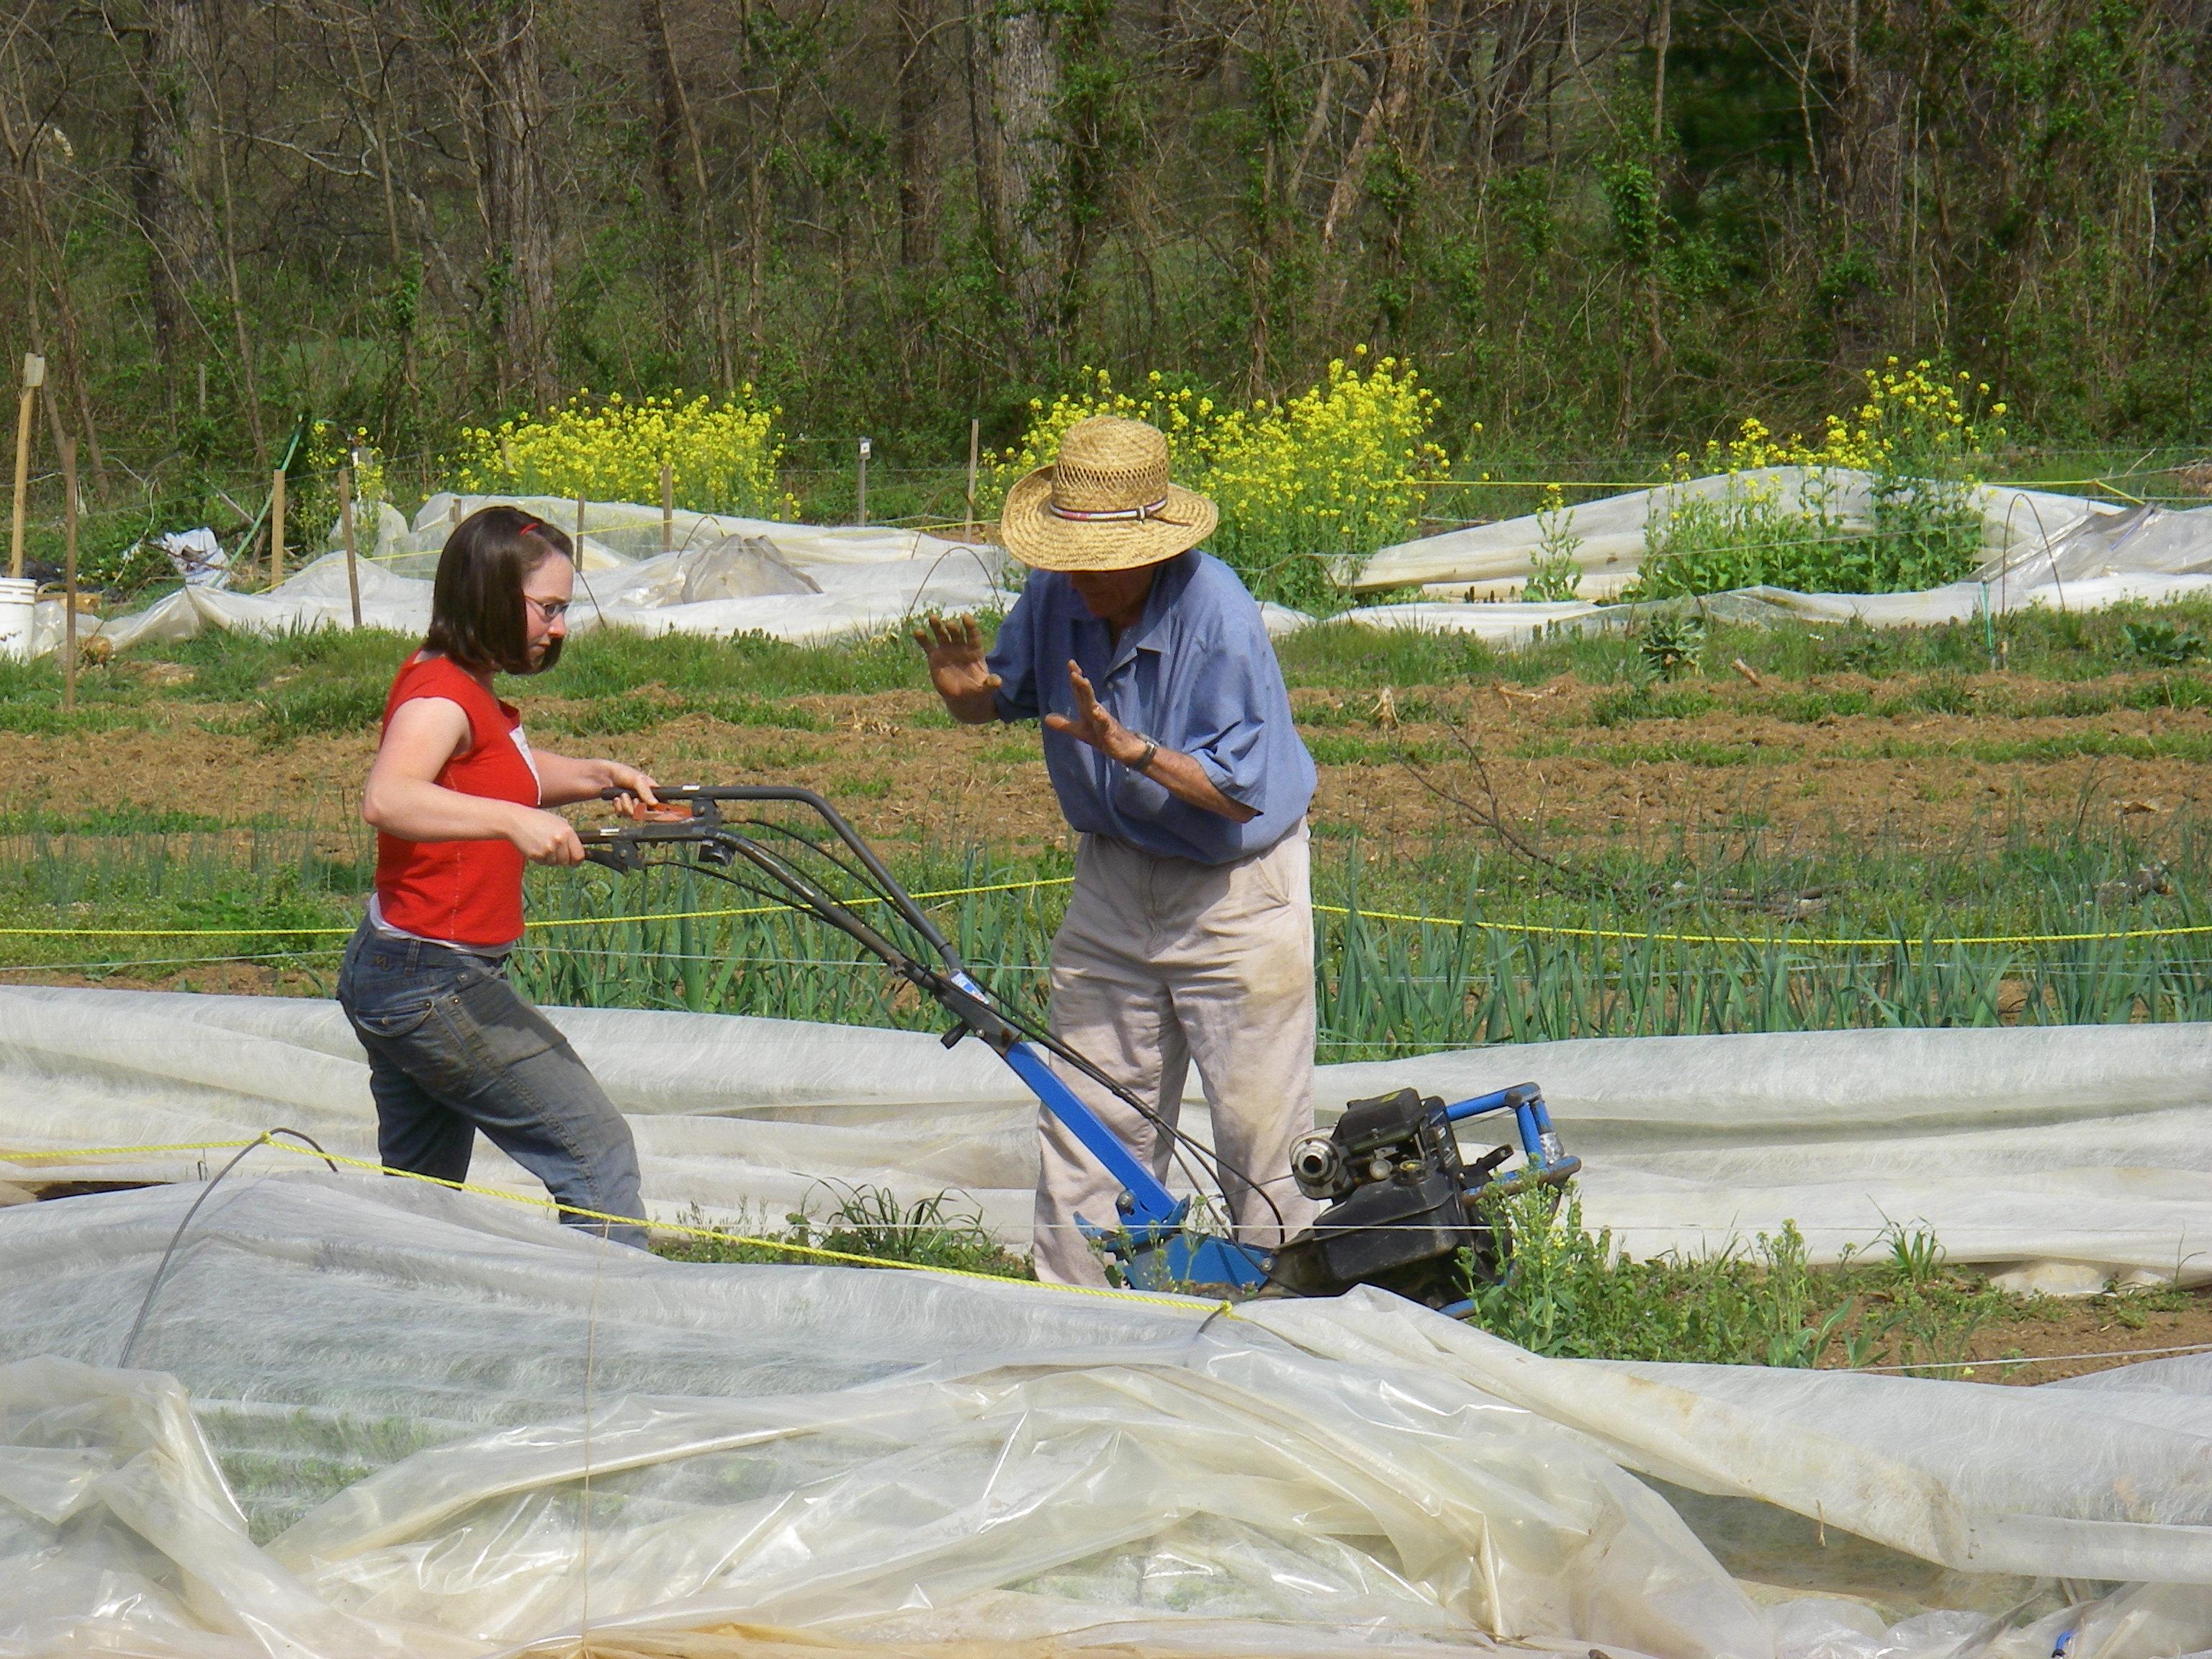 Dr. Wilson shows Kristen how to use the tillerImage by Dianna Schmitt McCall